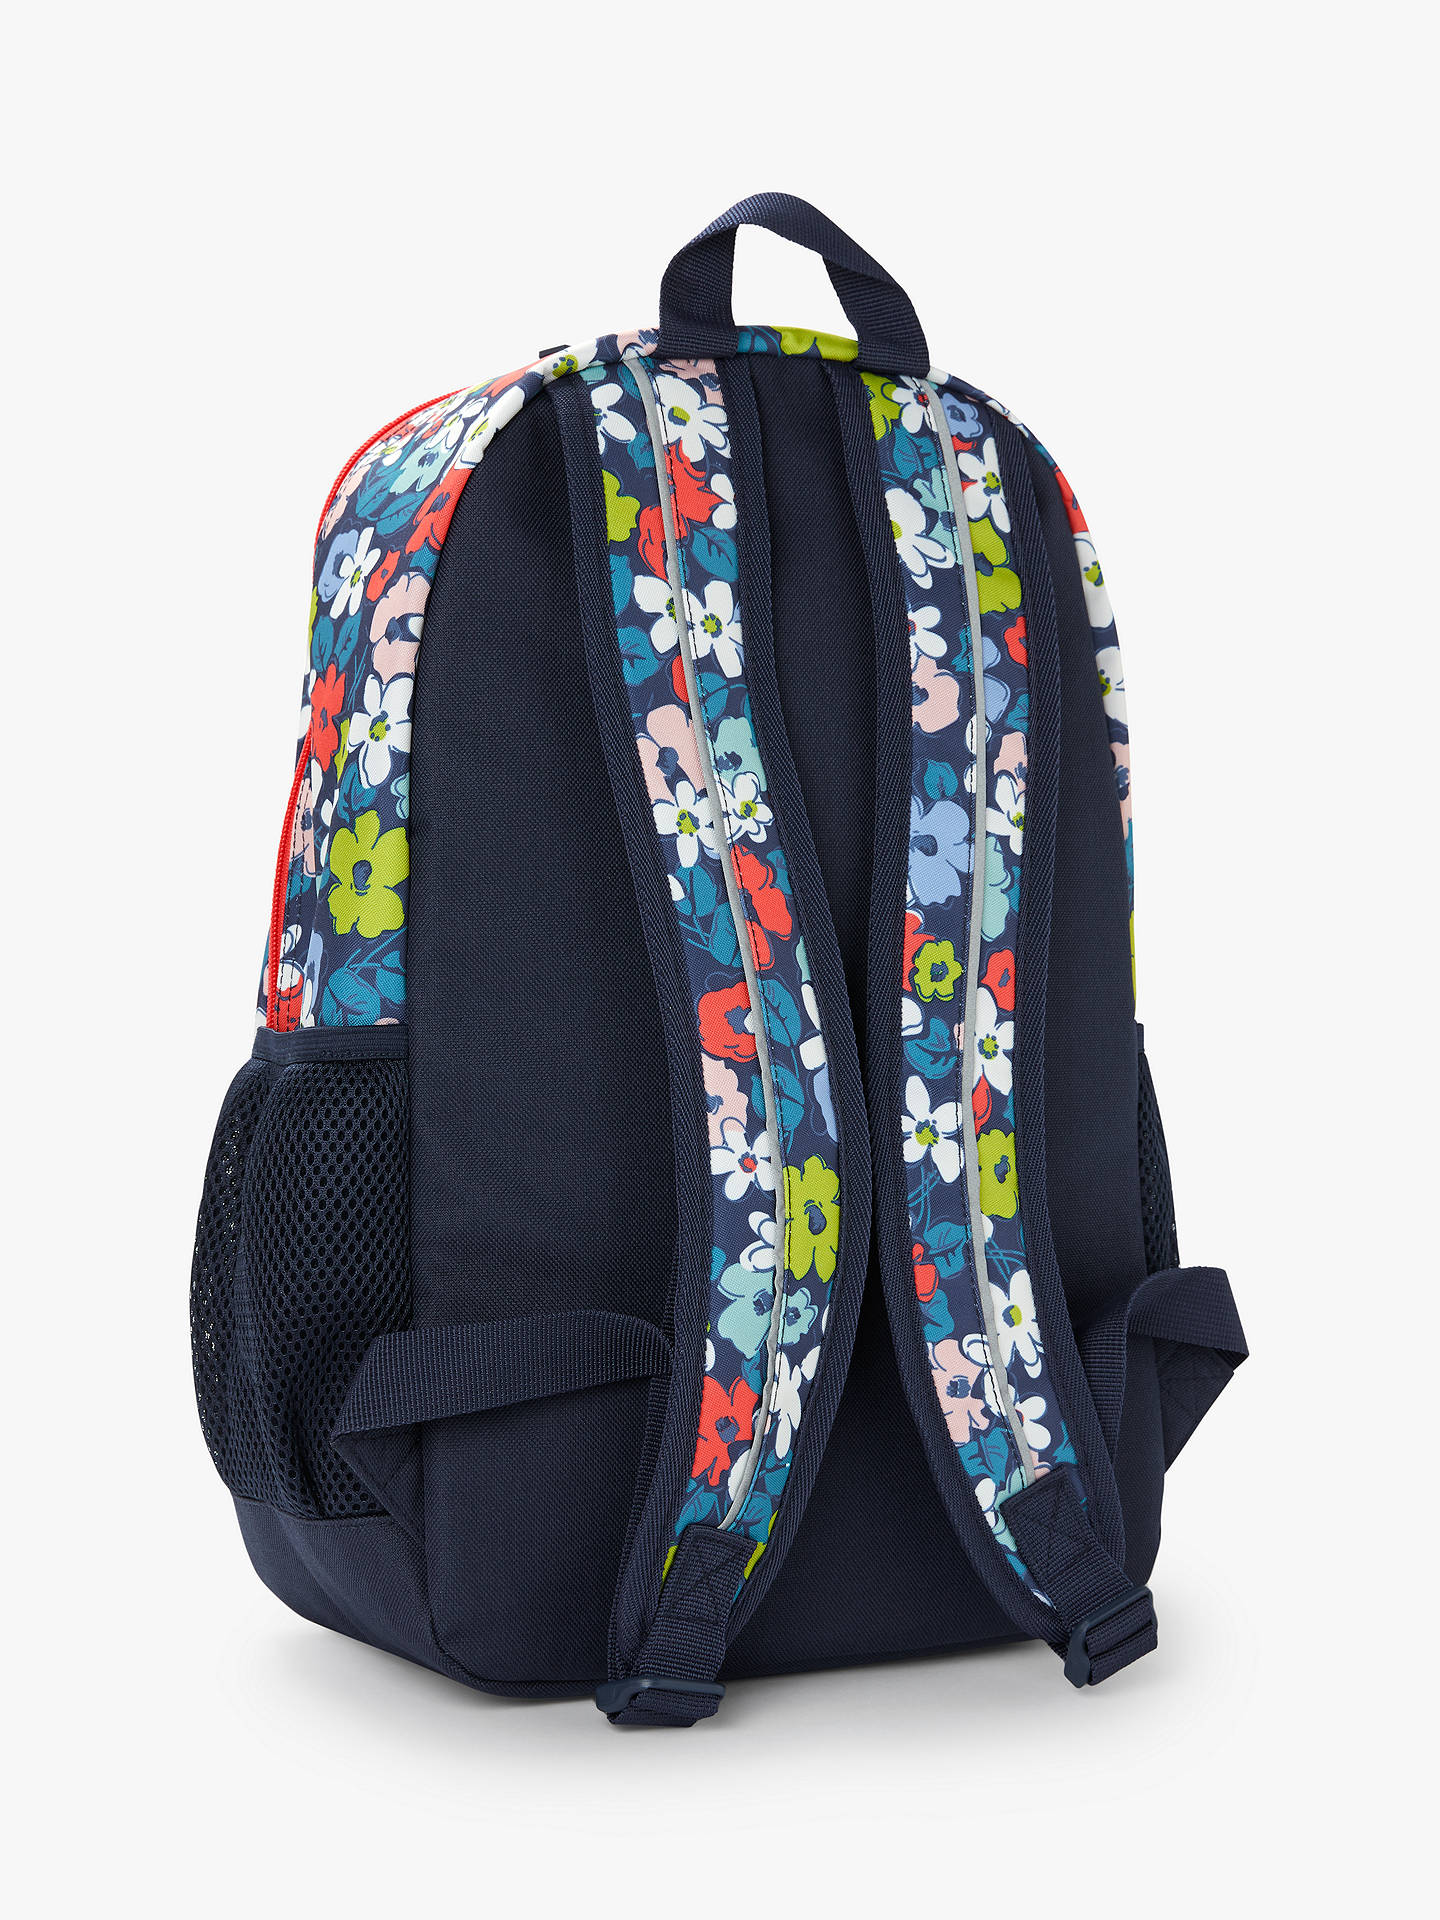 12cdfa9404 ... Buy John Lewis & Partners Floral Children's Backpack Online at johnlewis.  ...